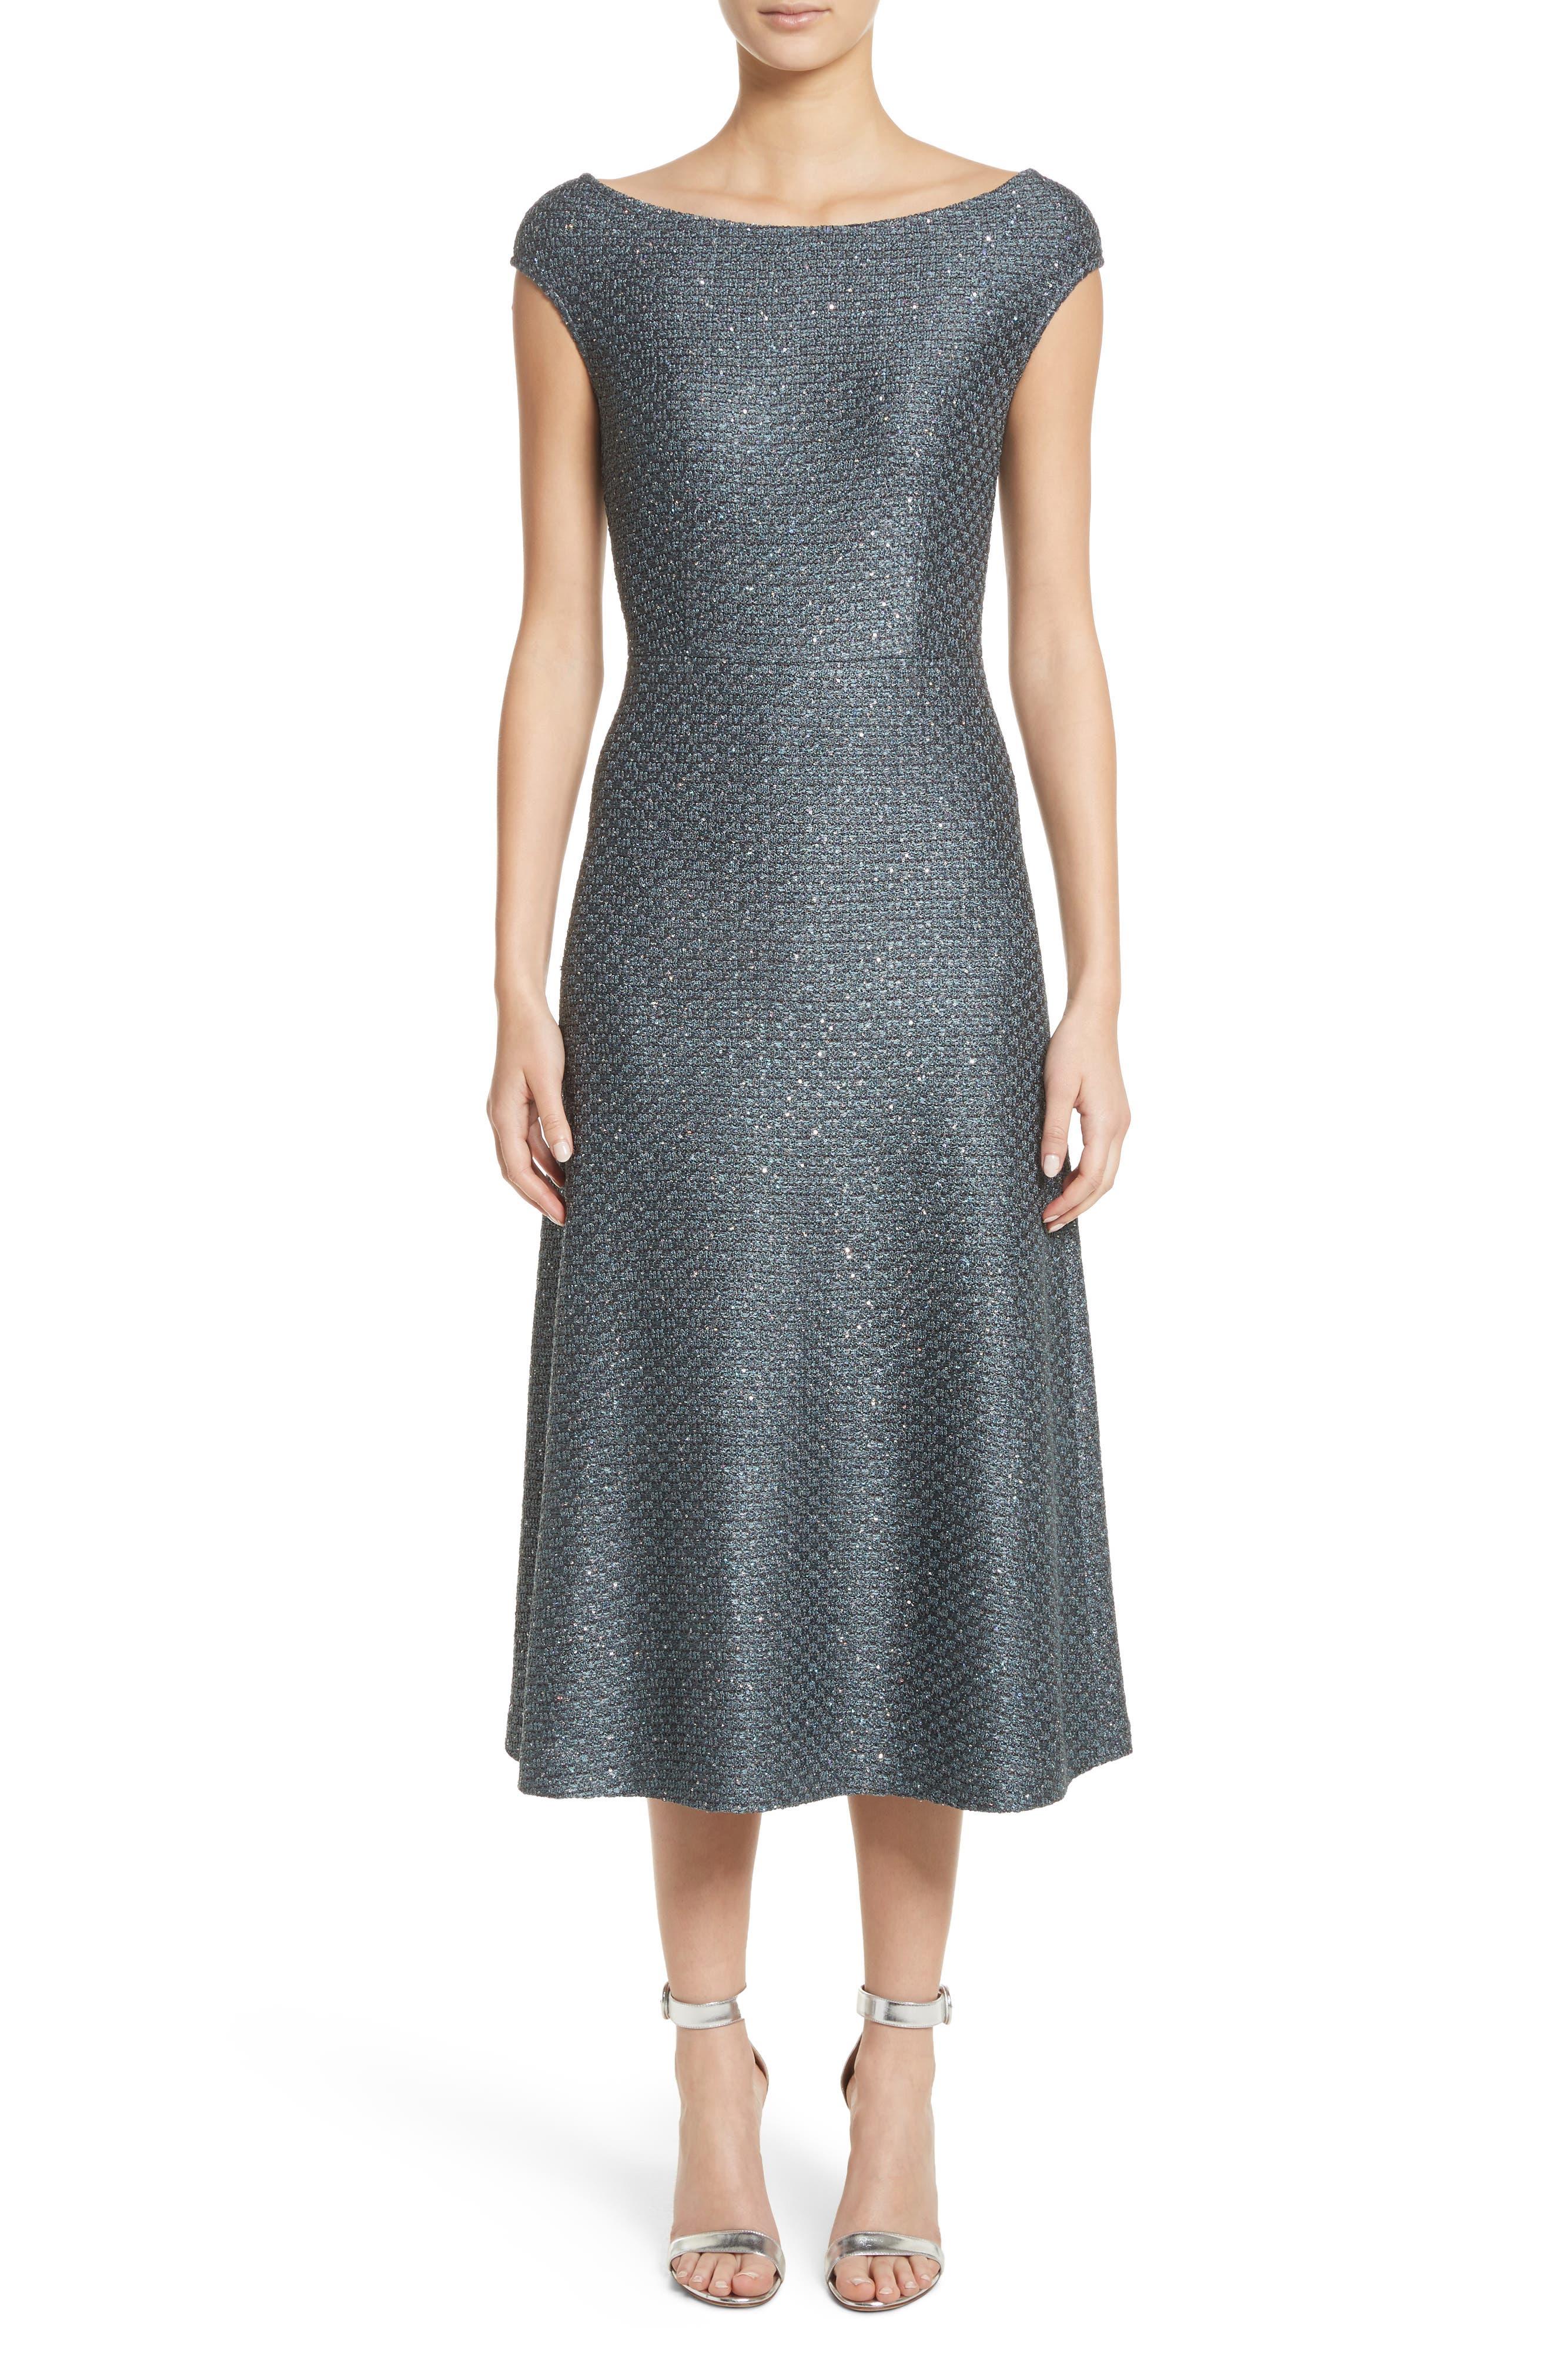 St. John Collection Sequin Knit Midi Dress